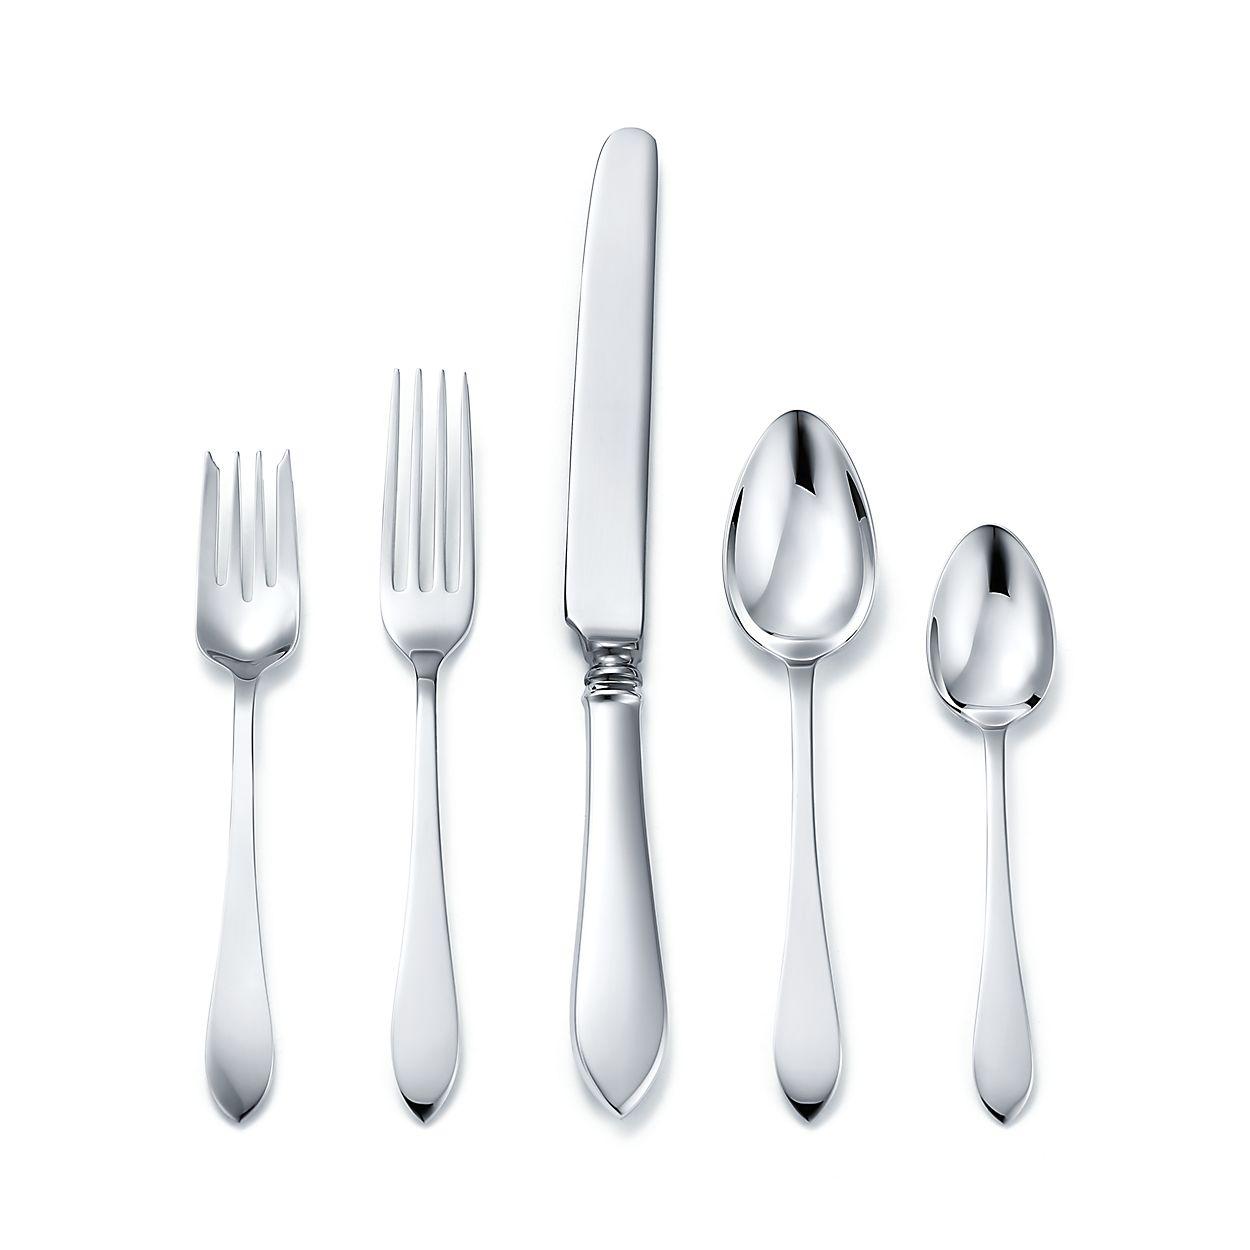 Faneuil five-piece flatware set in sterling silver. | Tiffany & Co.